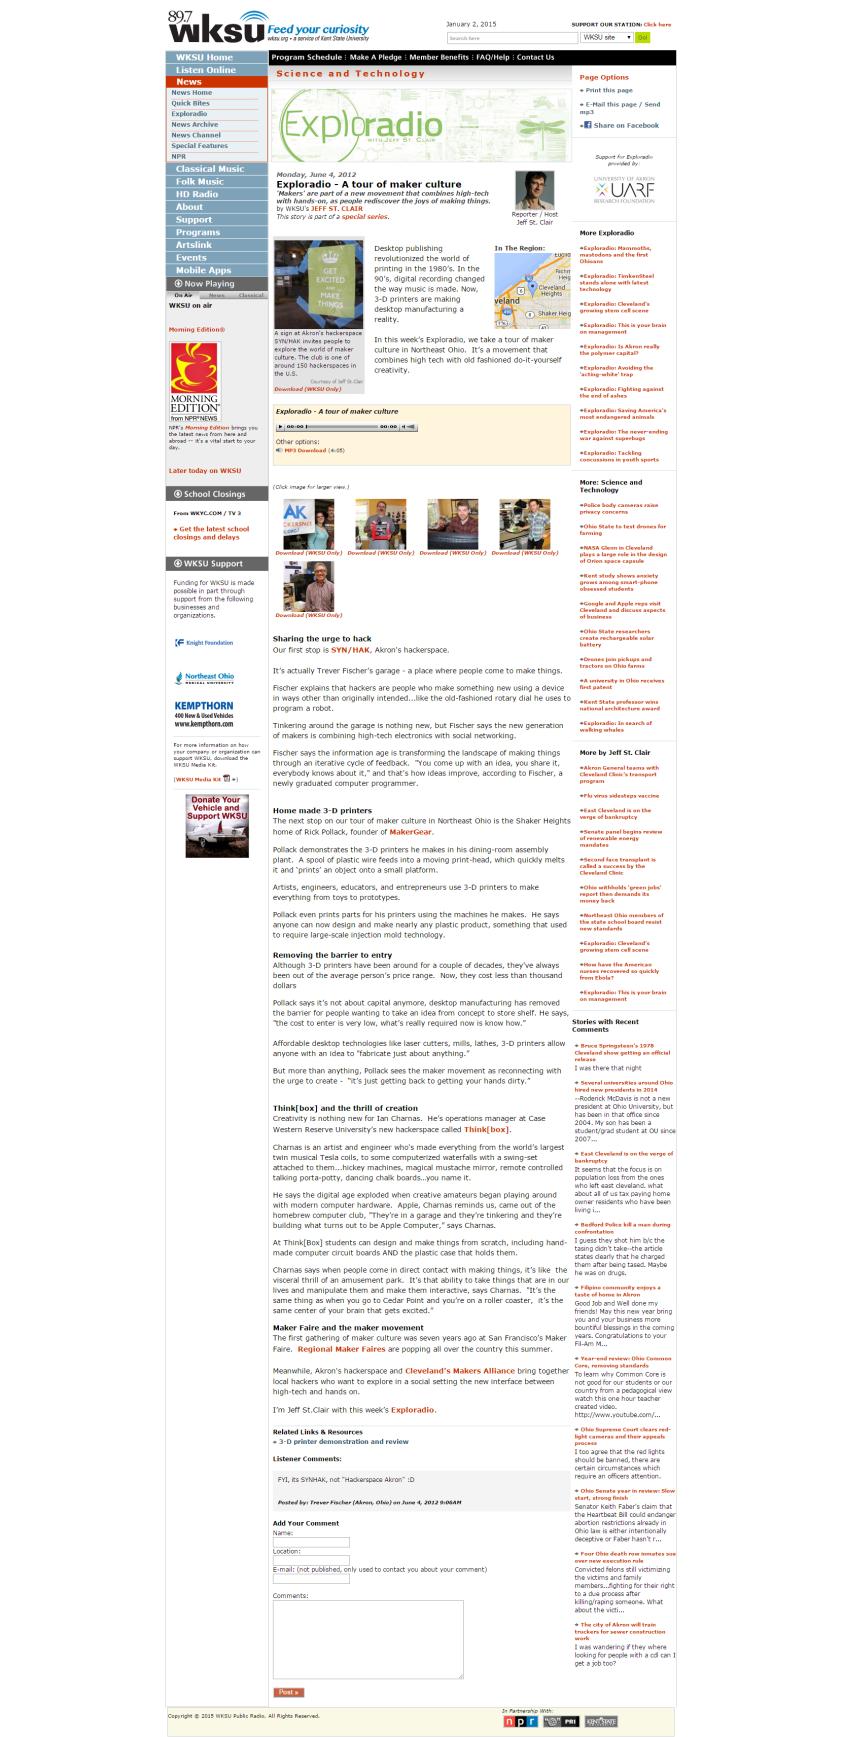 WKSU News Exploradio A tour of maker culture